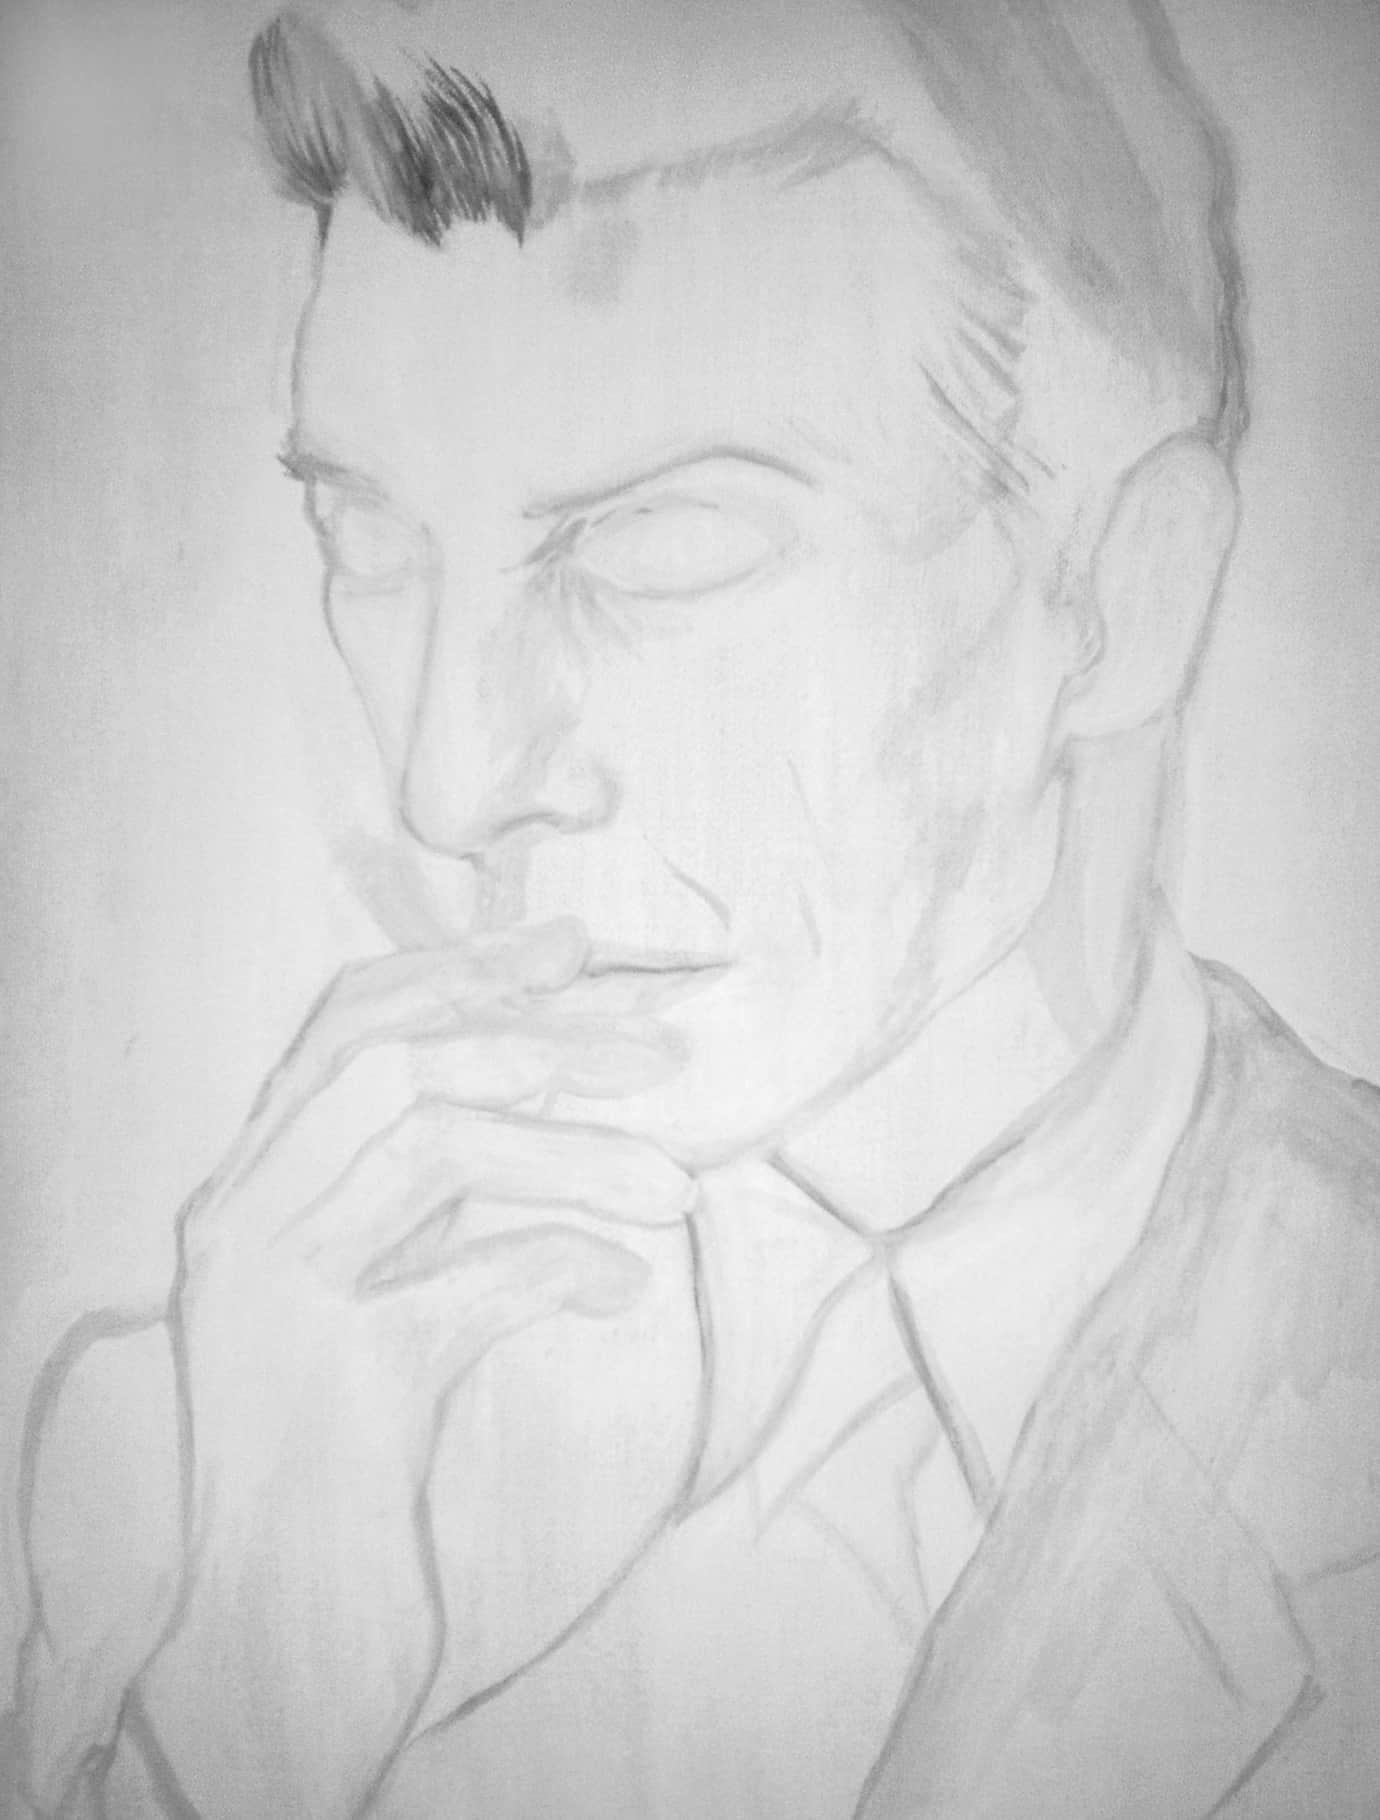 David bowie davidbowie aleena sharif aleenasharif.co.uk gouache paint painting monochrome black white canvas work in progress WIP